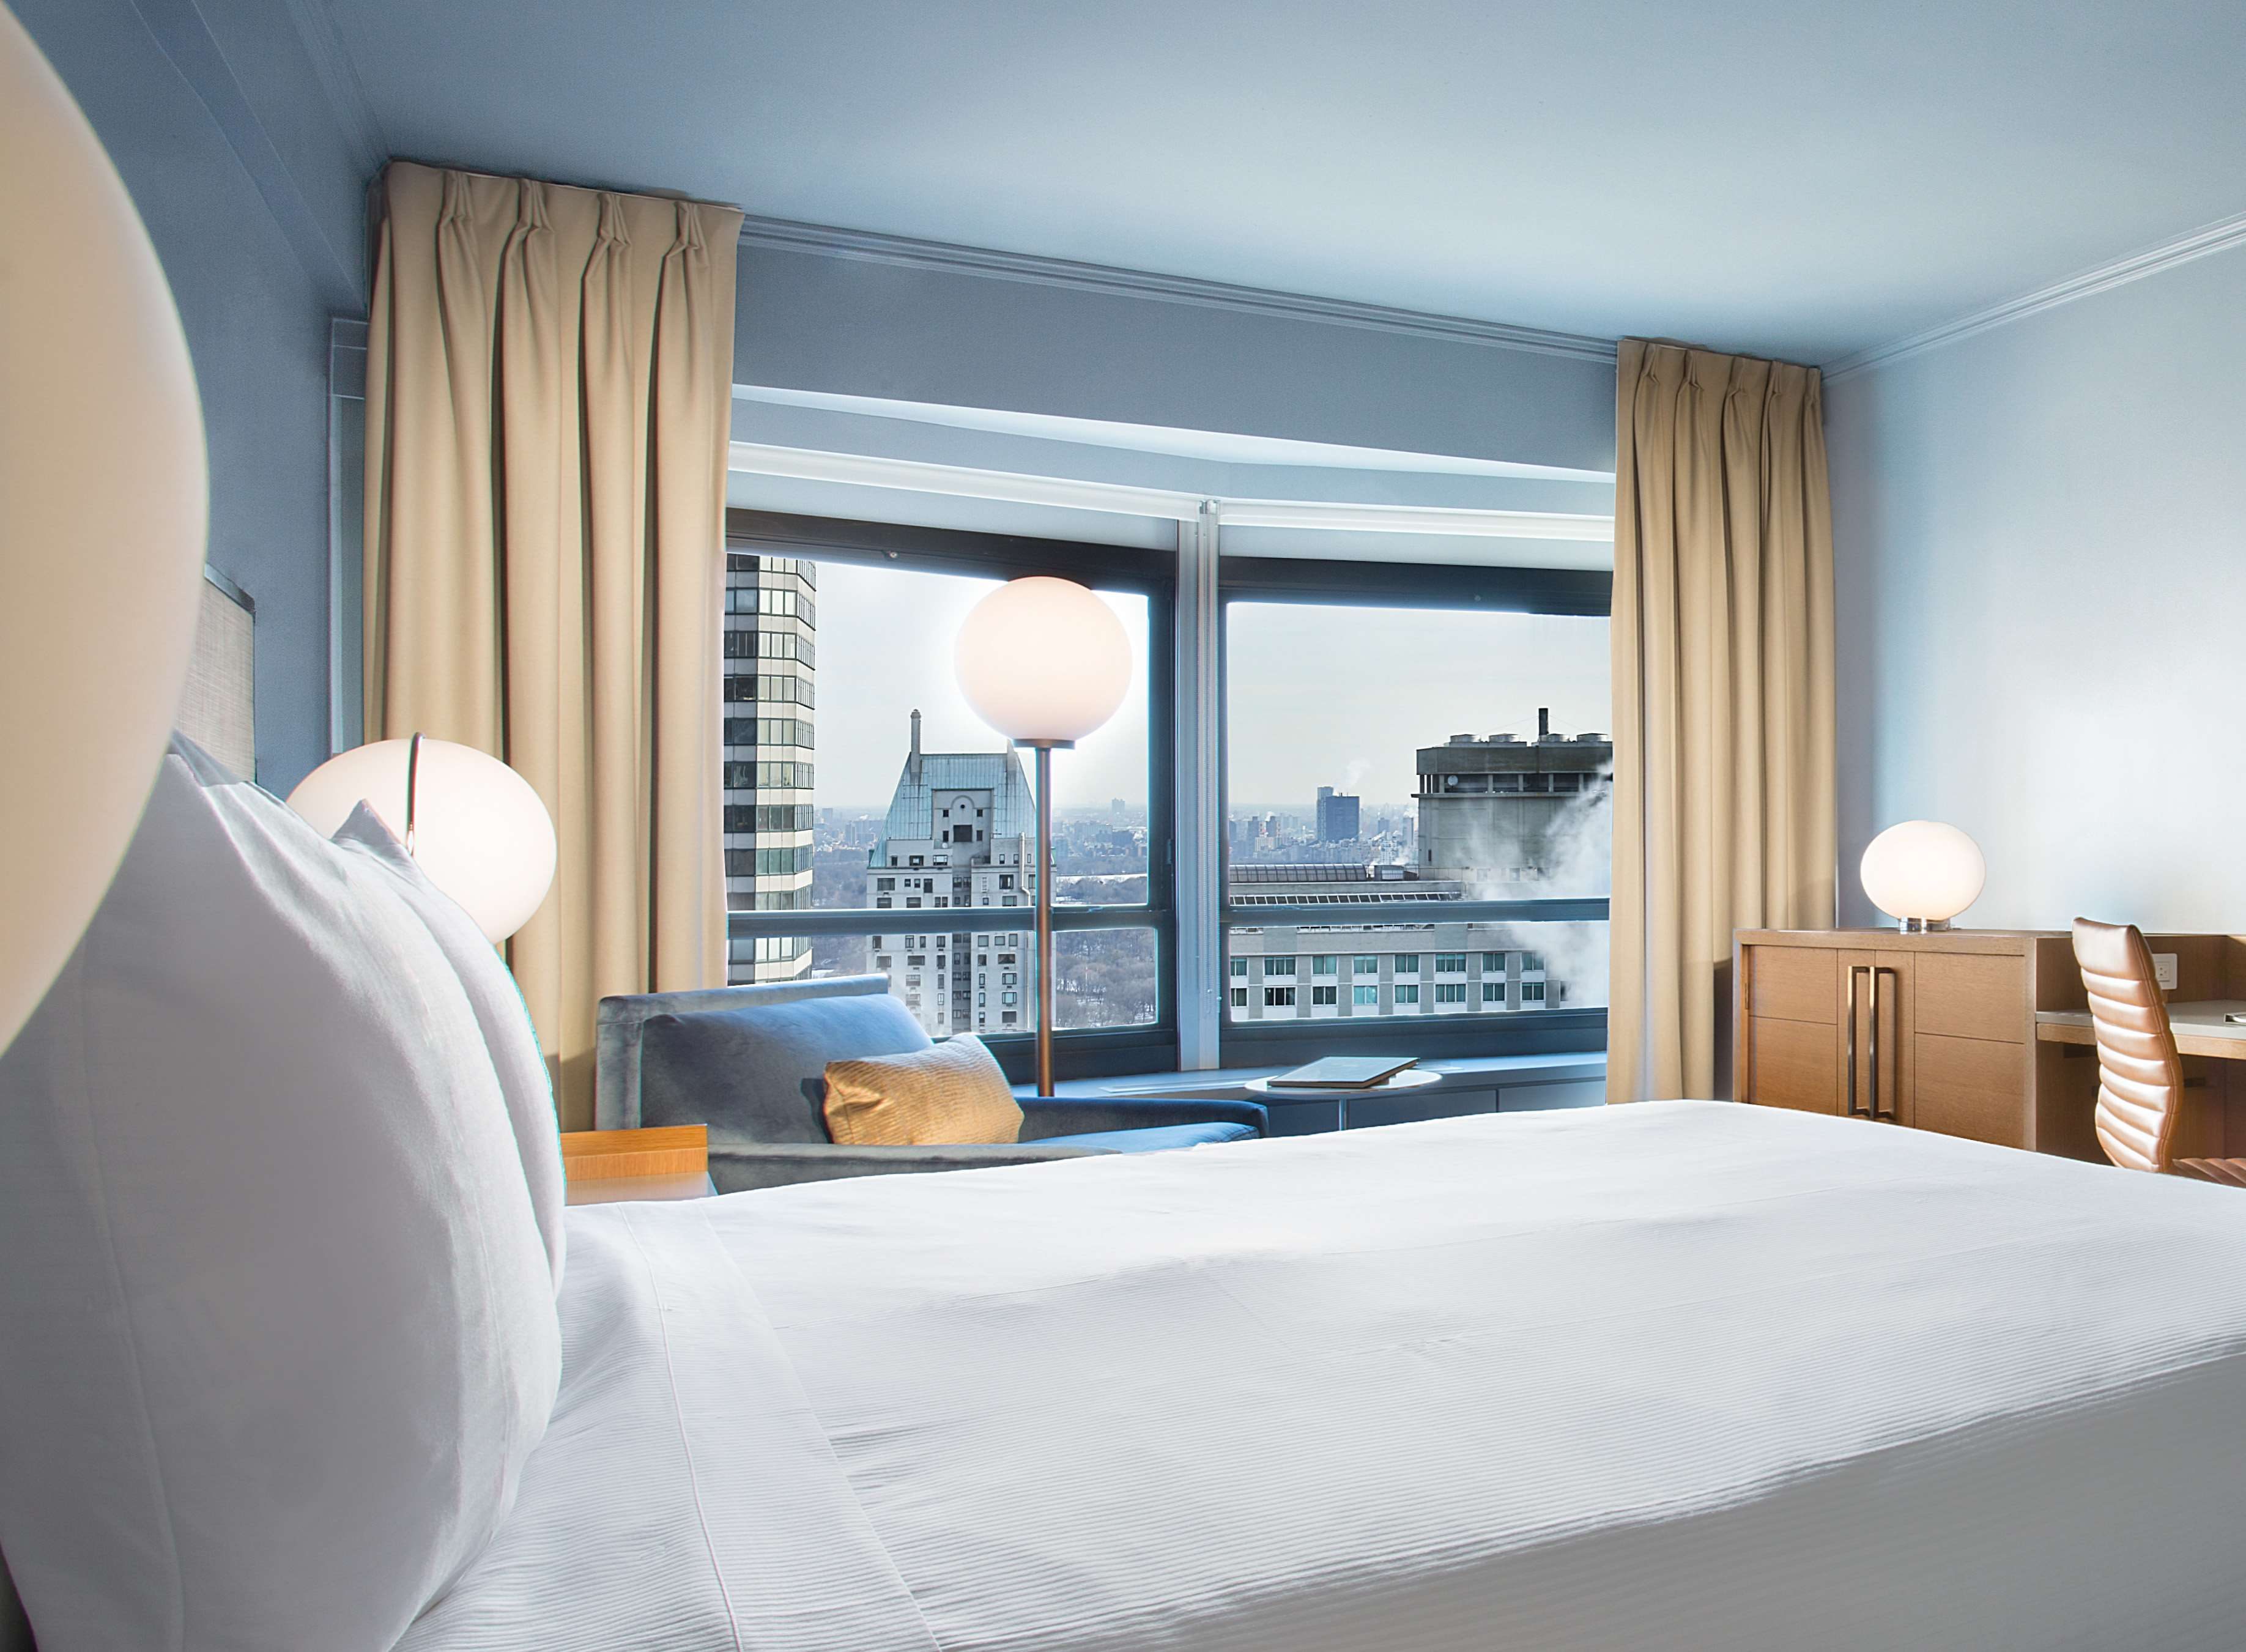 New York Hilton Midtown image 32